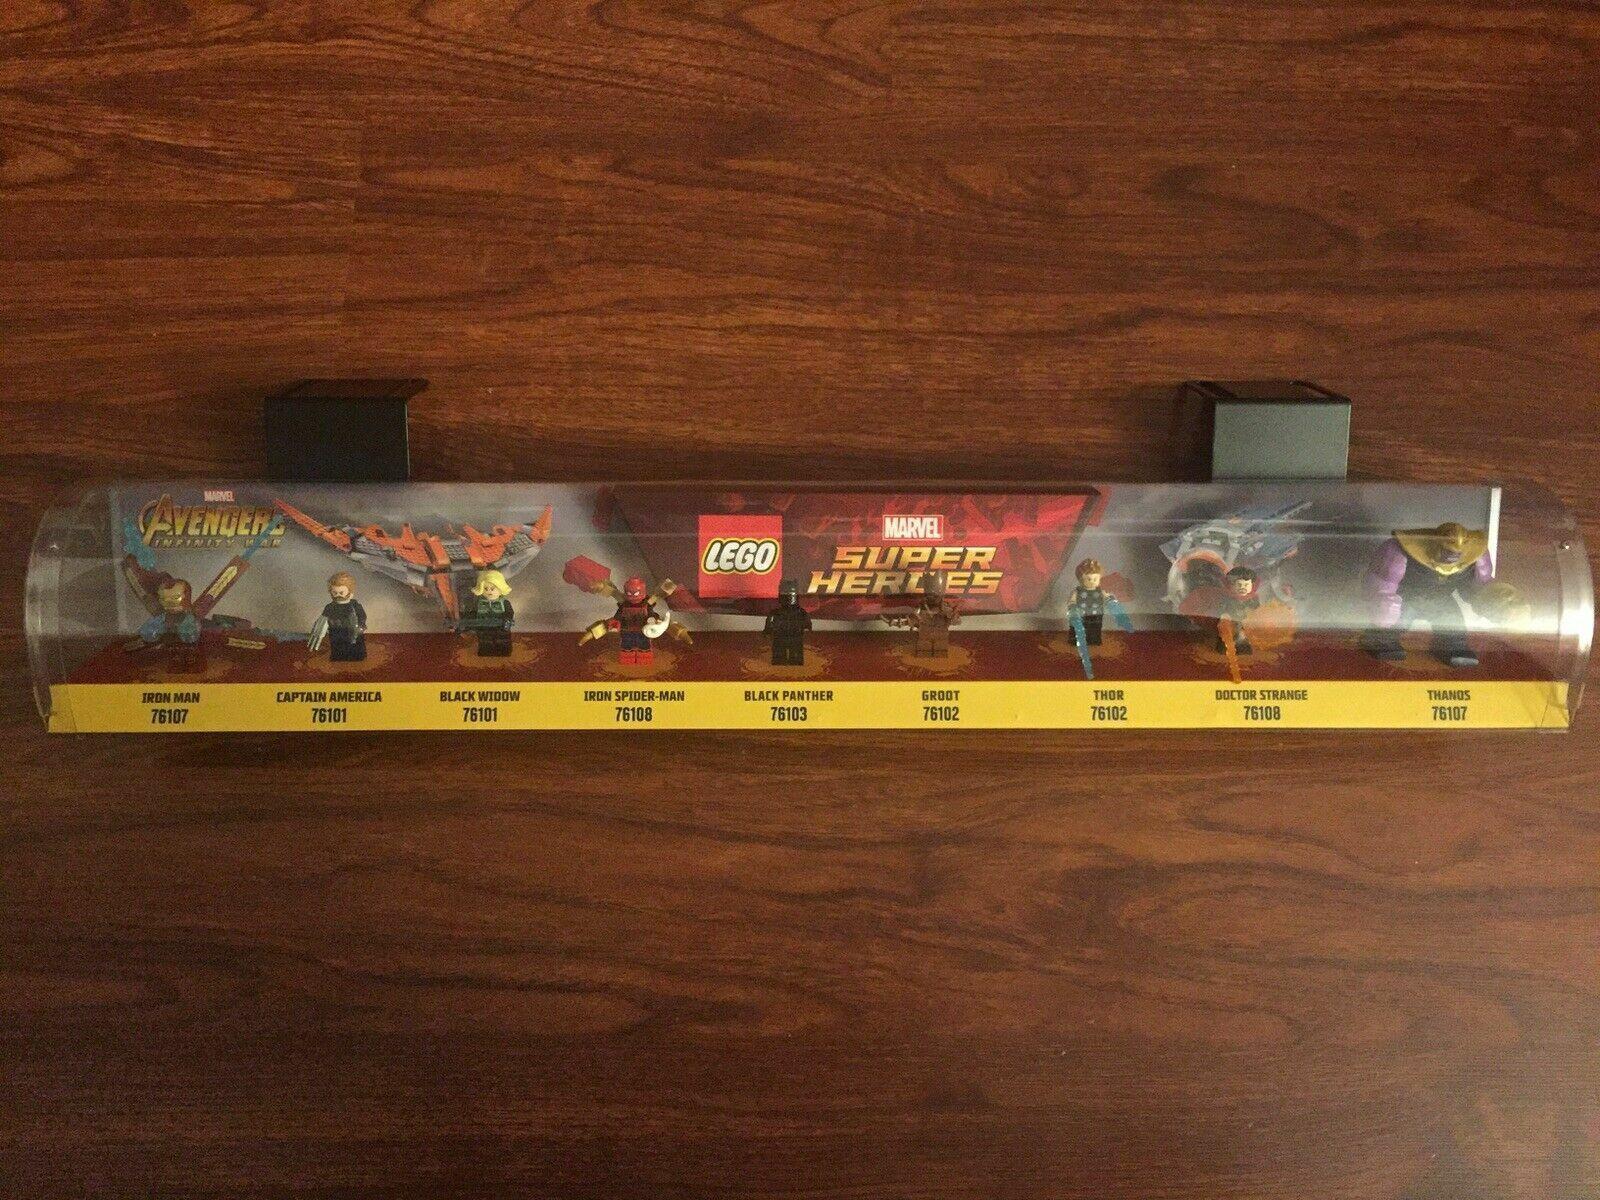 LEGO Marvel Super Heroes Avengers Infinity War Mini Figure Store Display Piece